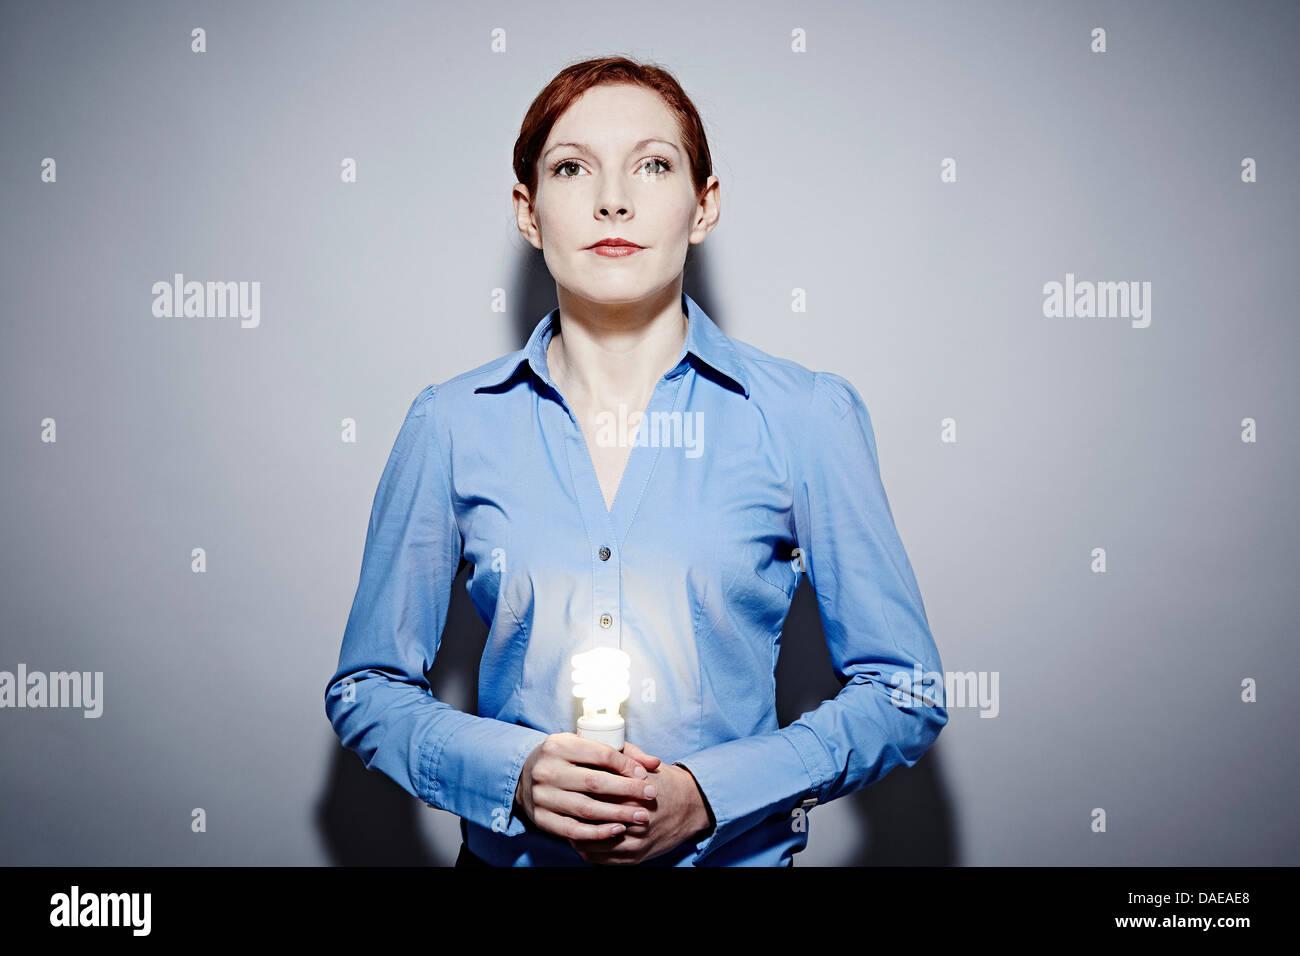 Studio portrait of young business woman holding lit lightbulb - Stock Image